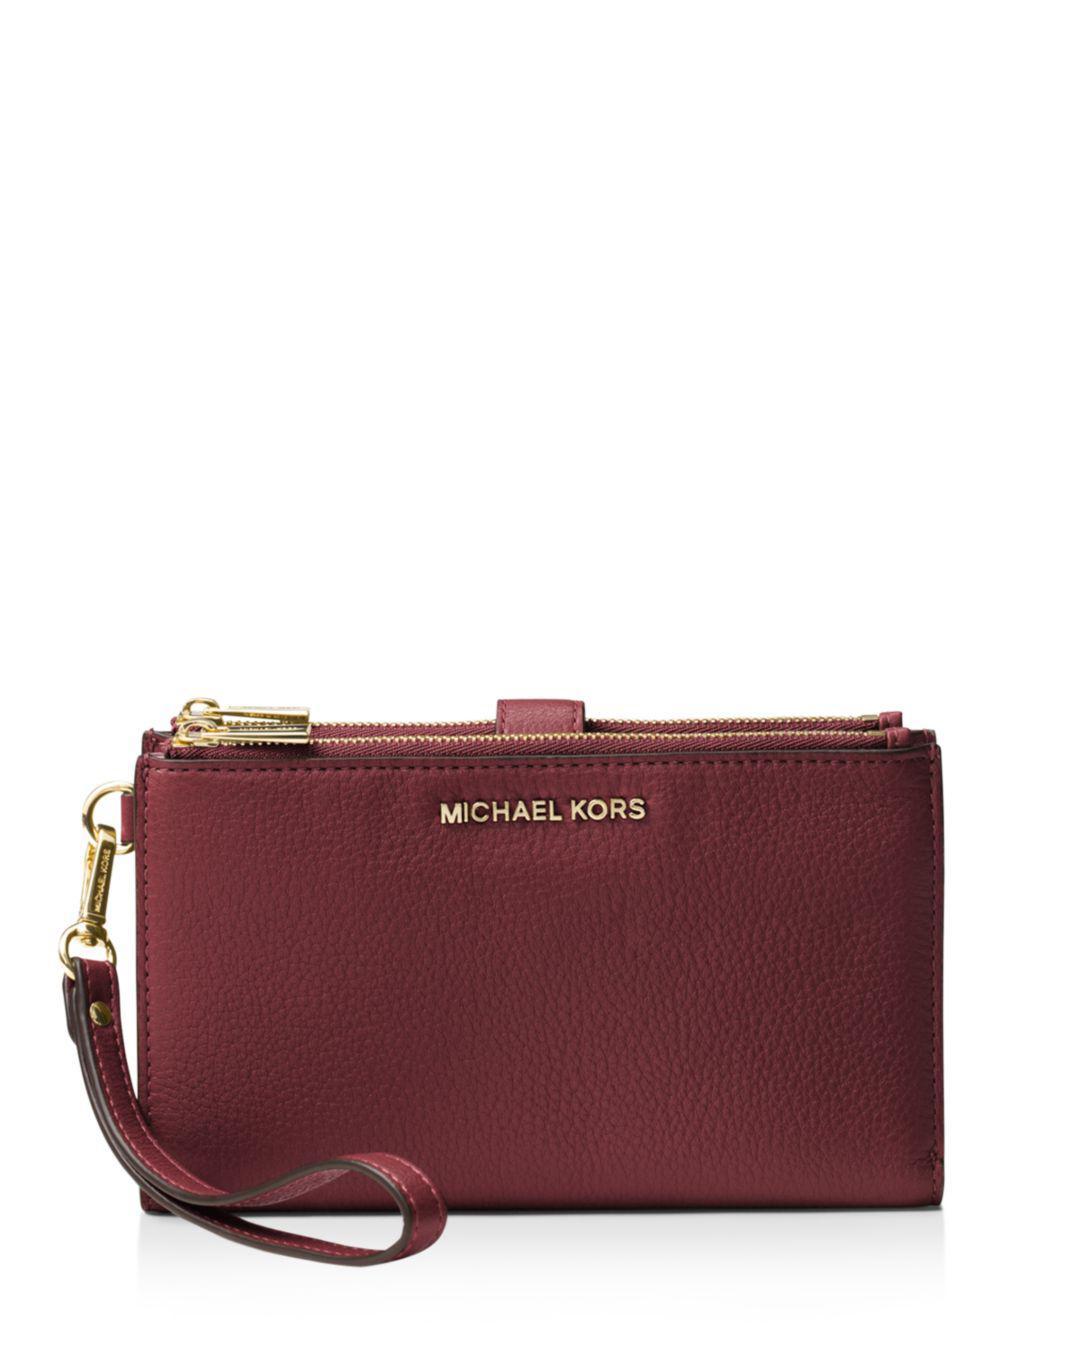 114af83fda18c Michael Michael Kors Adele Double Zip Leather Iphone 7 Plus 8 Plus ...